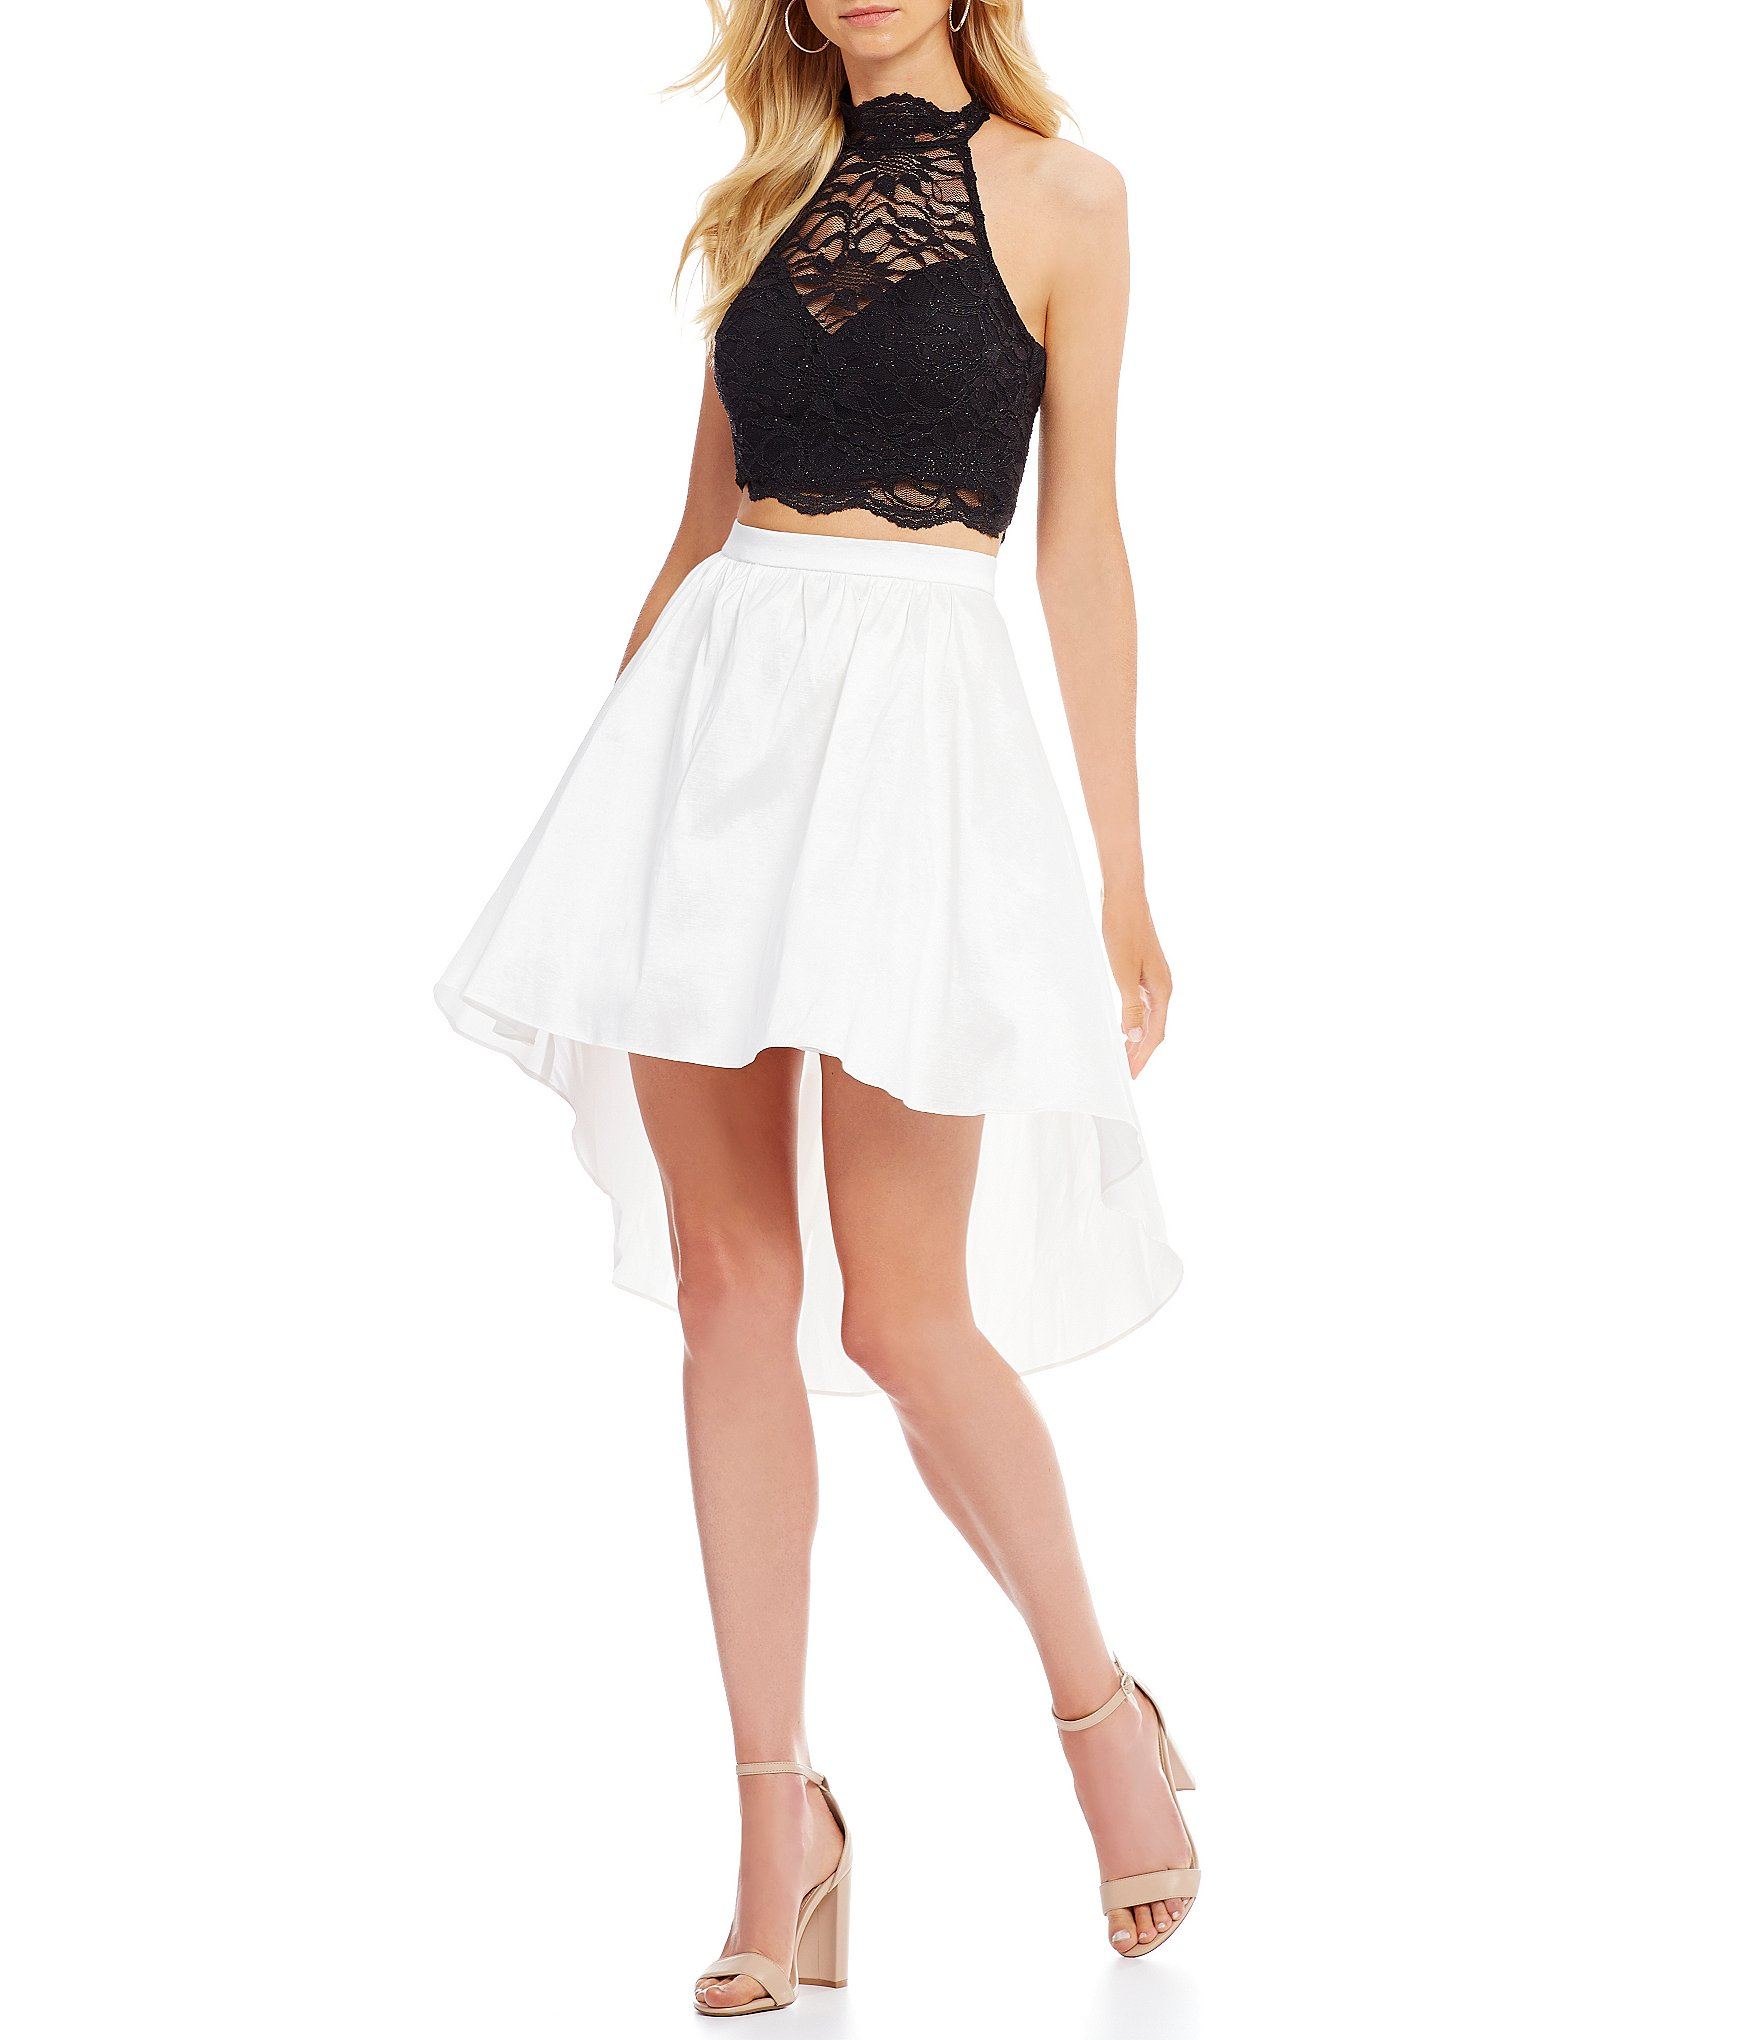 B. Darlin Mock Neck Lace Top Two-Piece High-Low Dress   Dillards